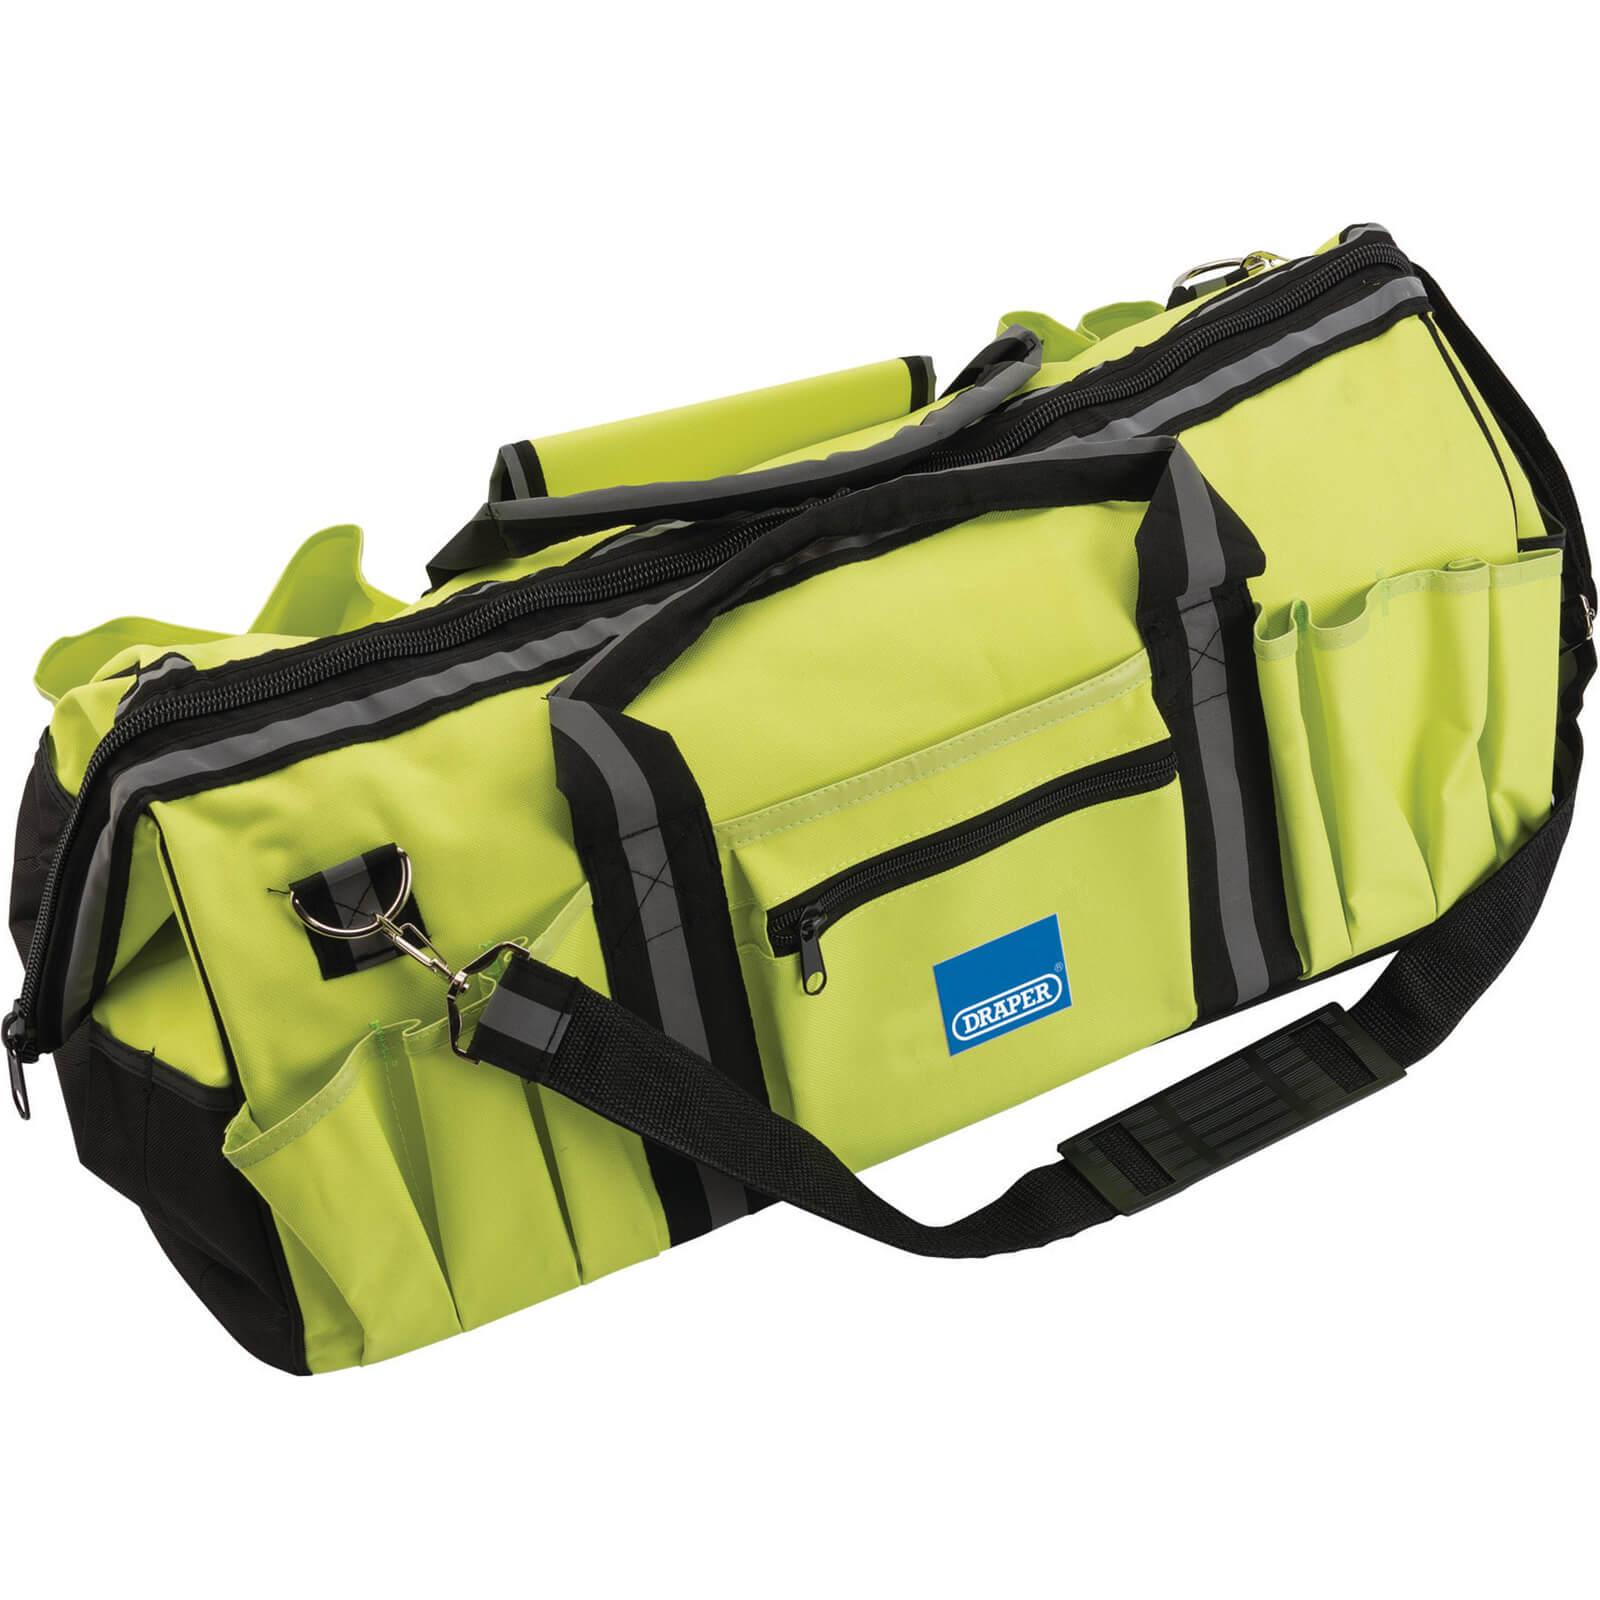 Draper Expert HVTB TW© High Vis Tool Bag